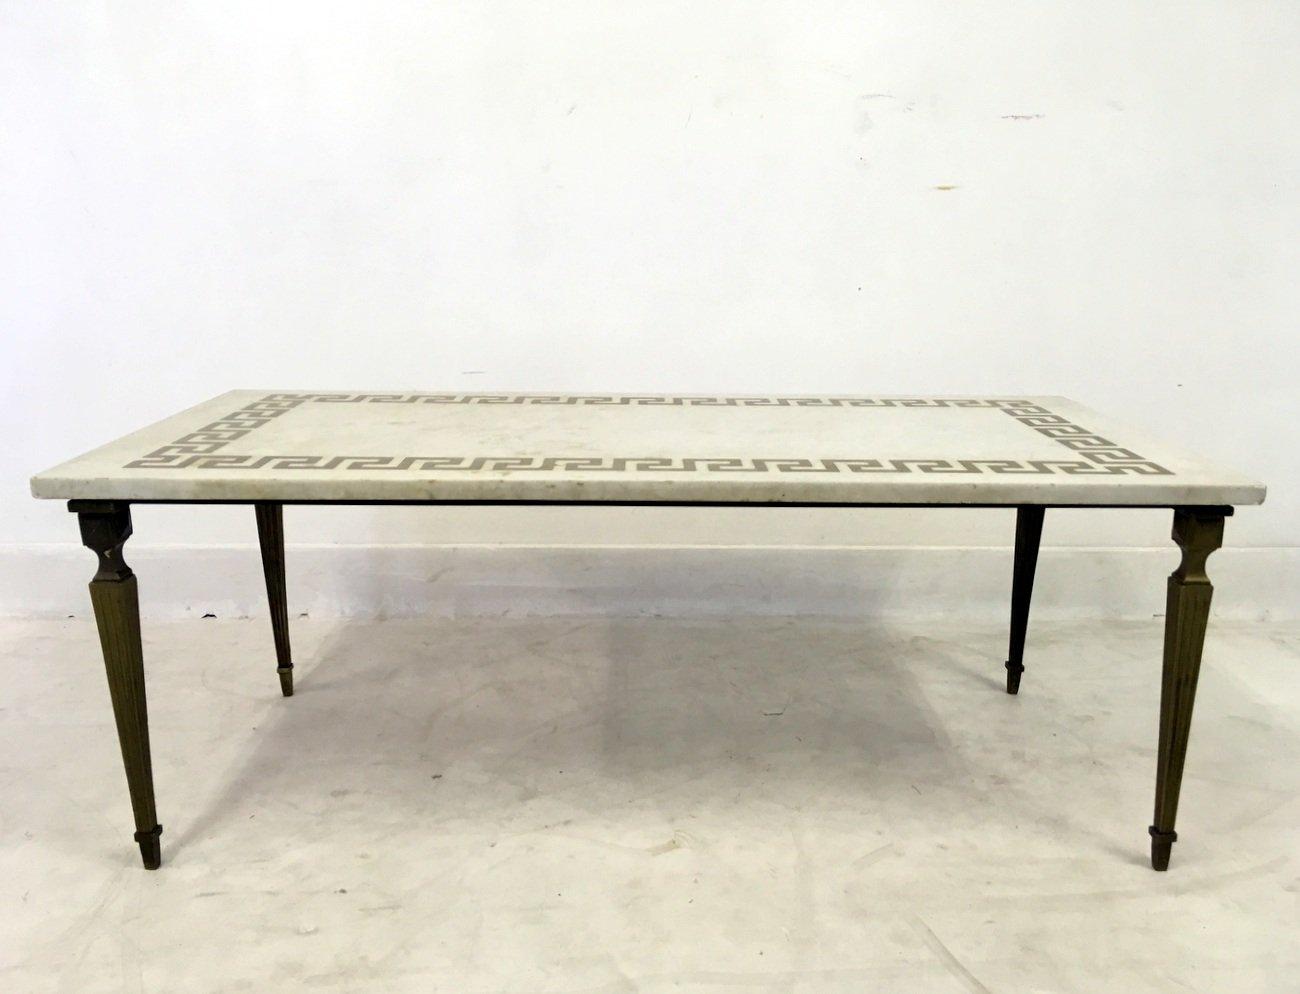 couchtisch aus wei em marmor messing 1950er bei pamono. Black Bedroom Furniture Sets. Home Design Ideas